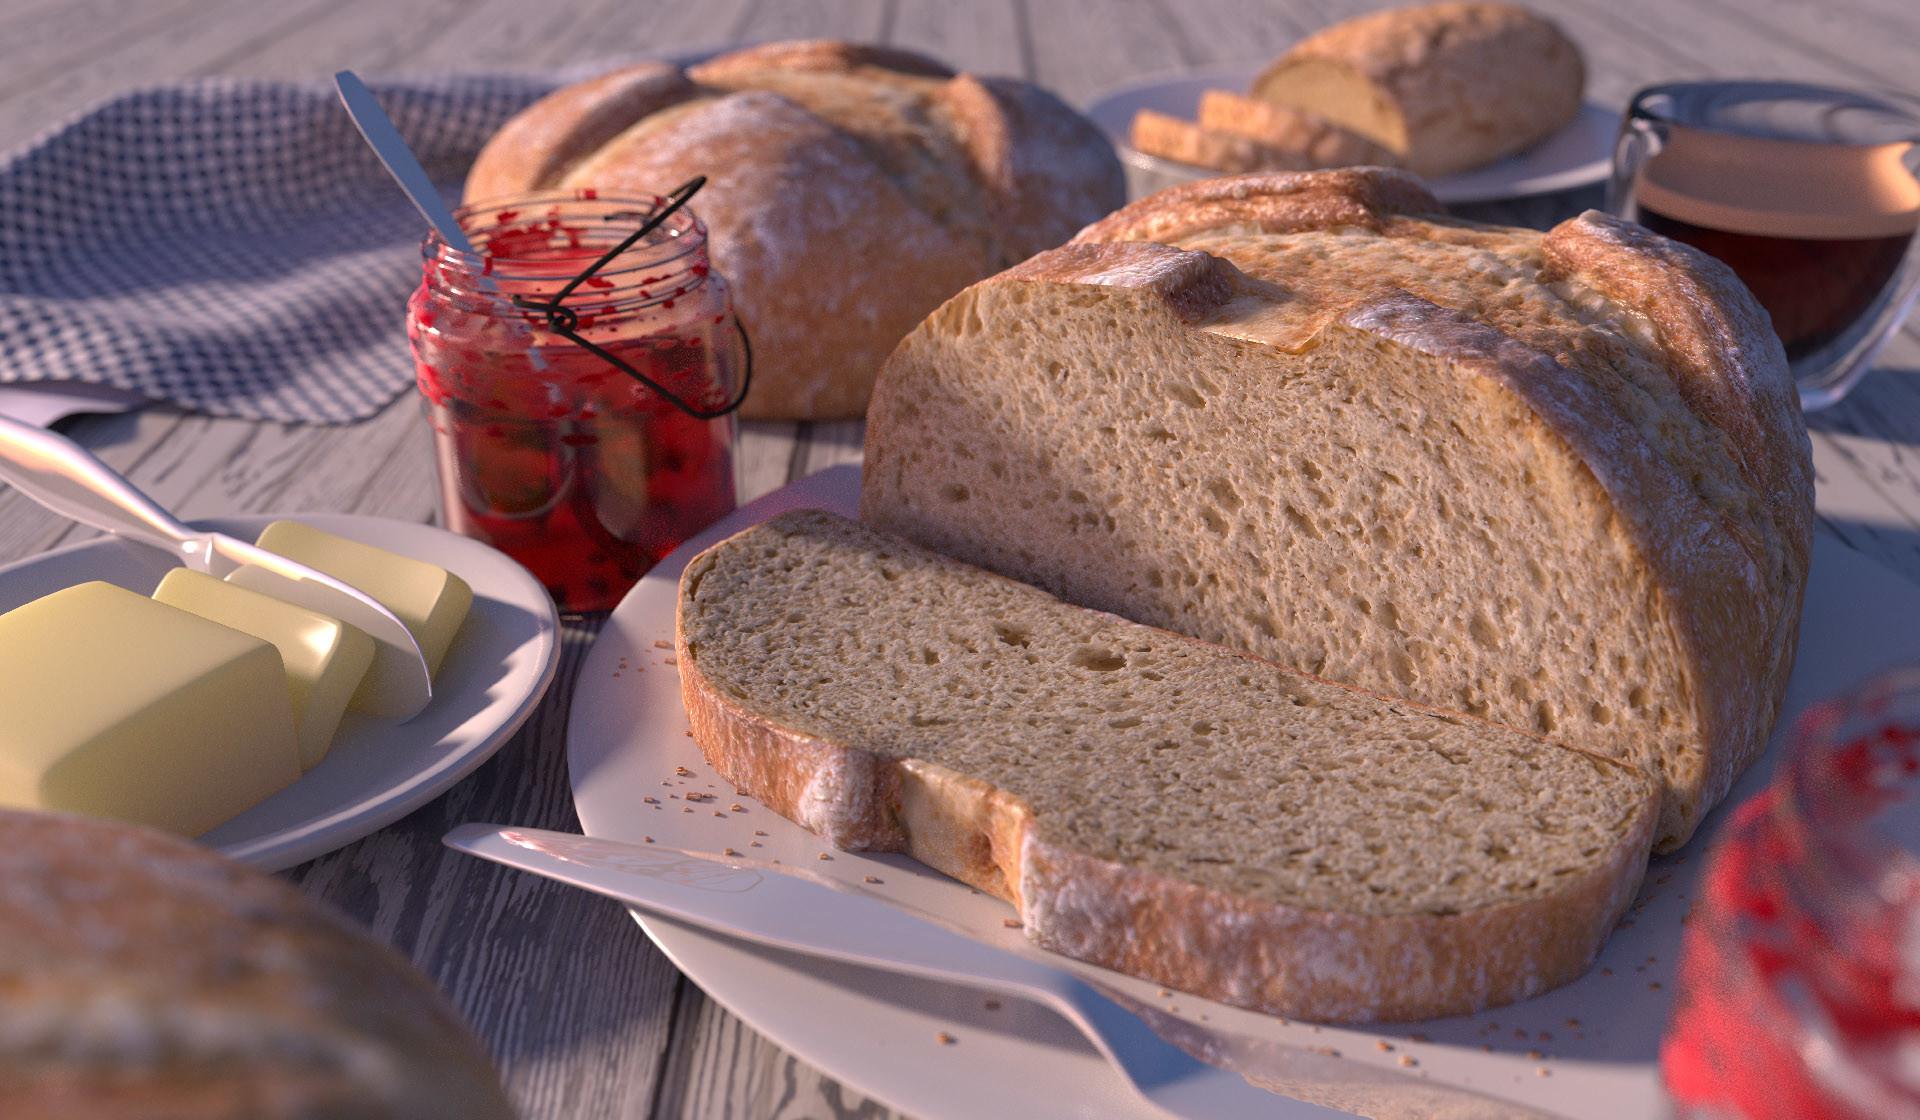 Andrew price bread massive downscaled